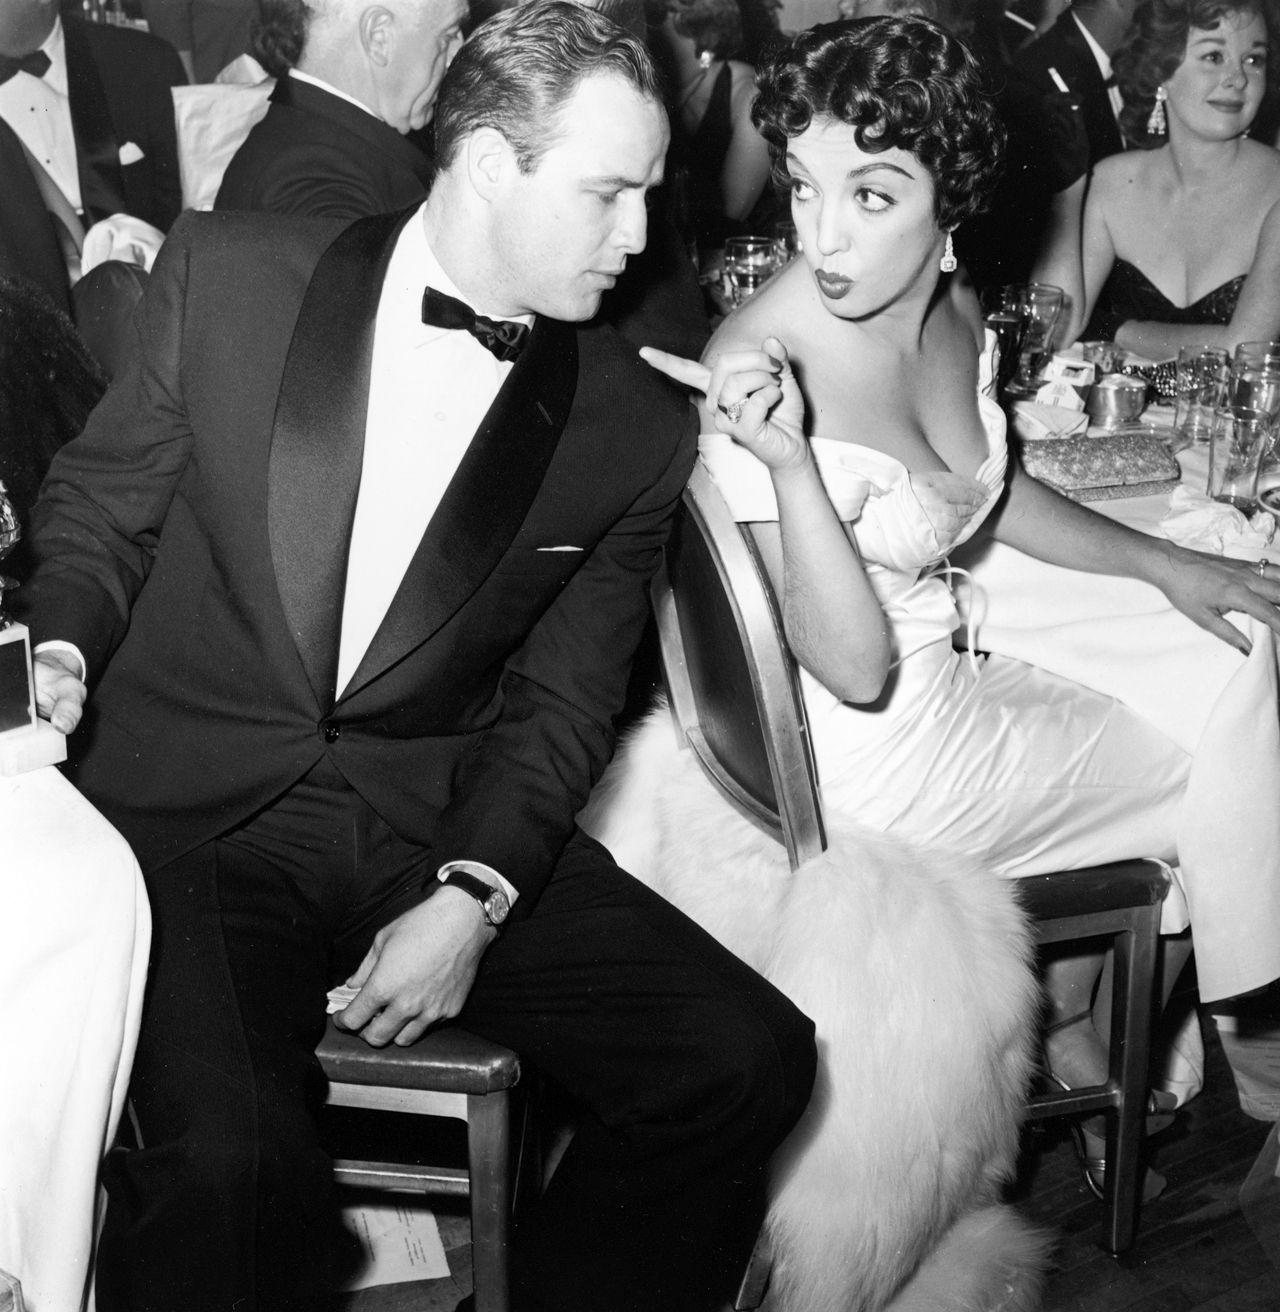 Marlon Brando And Katy Furtado